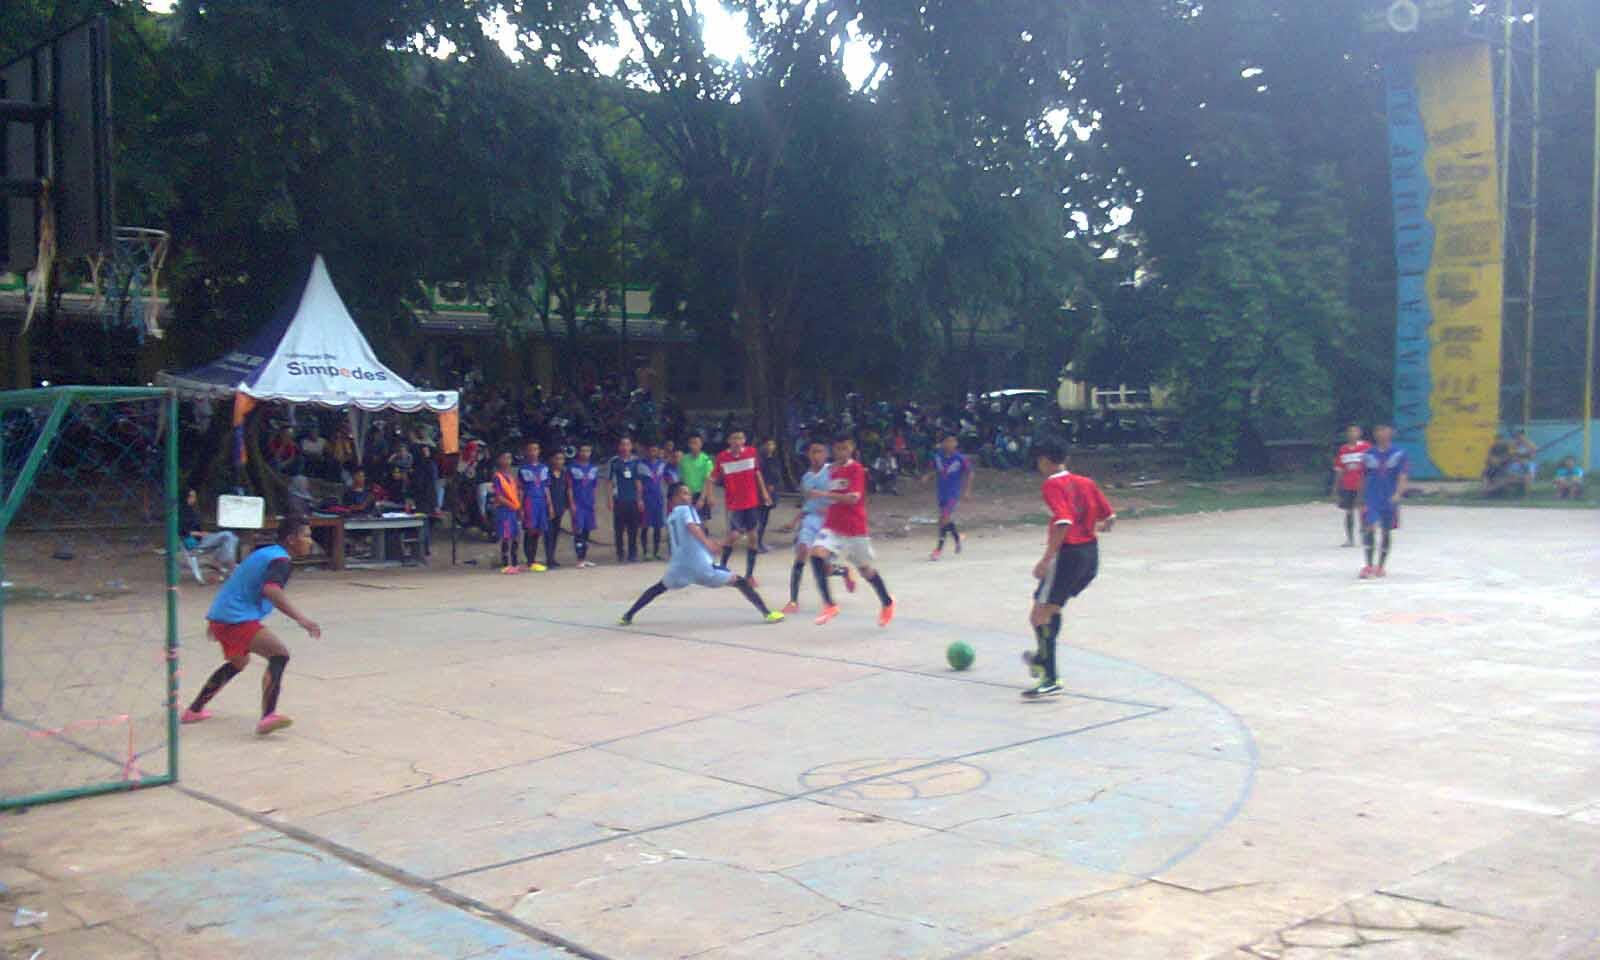 Foto : Wilfi Hari kedua pertandingan futsal oleh UKMK Penelitian dan Pengembangan UIN Raden Fatah Palembang dalam rangka perayaan milad ke-10. Sabtu (19/3/2016)